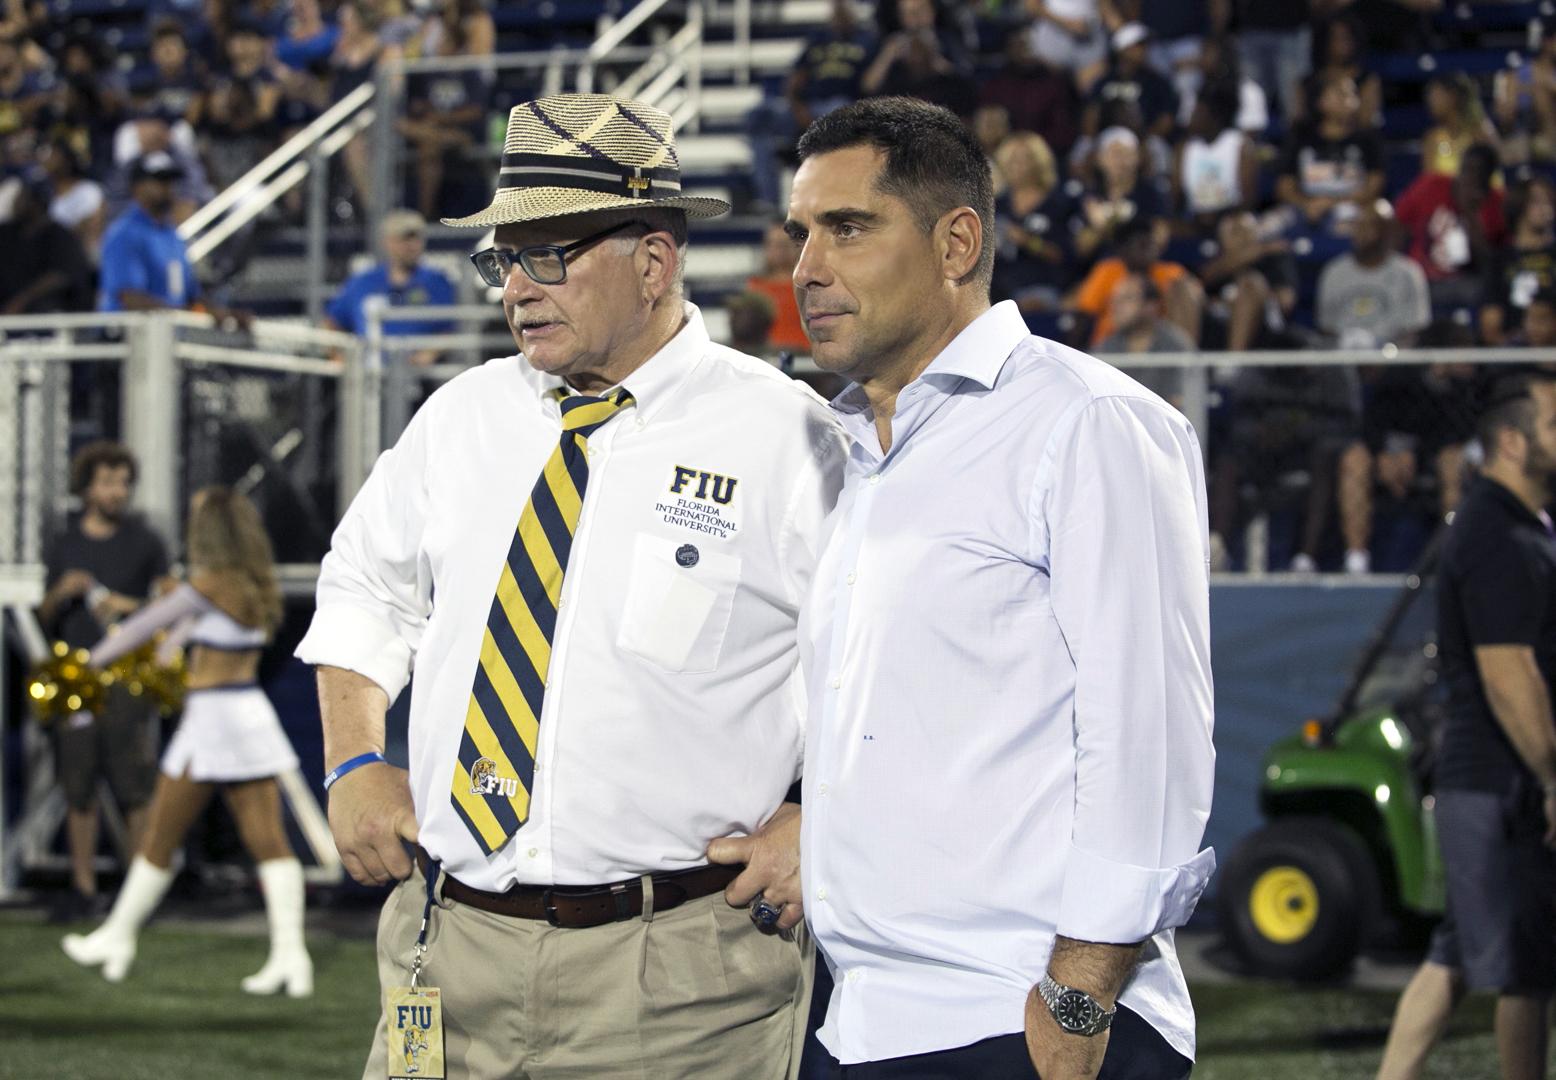 Riccardo Silva and The President of FIU, Dr Mark Rosenberg at Riccardo Silva Stadium